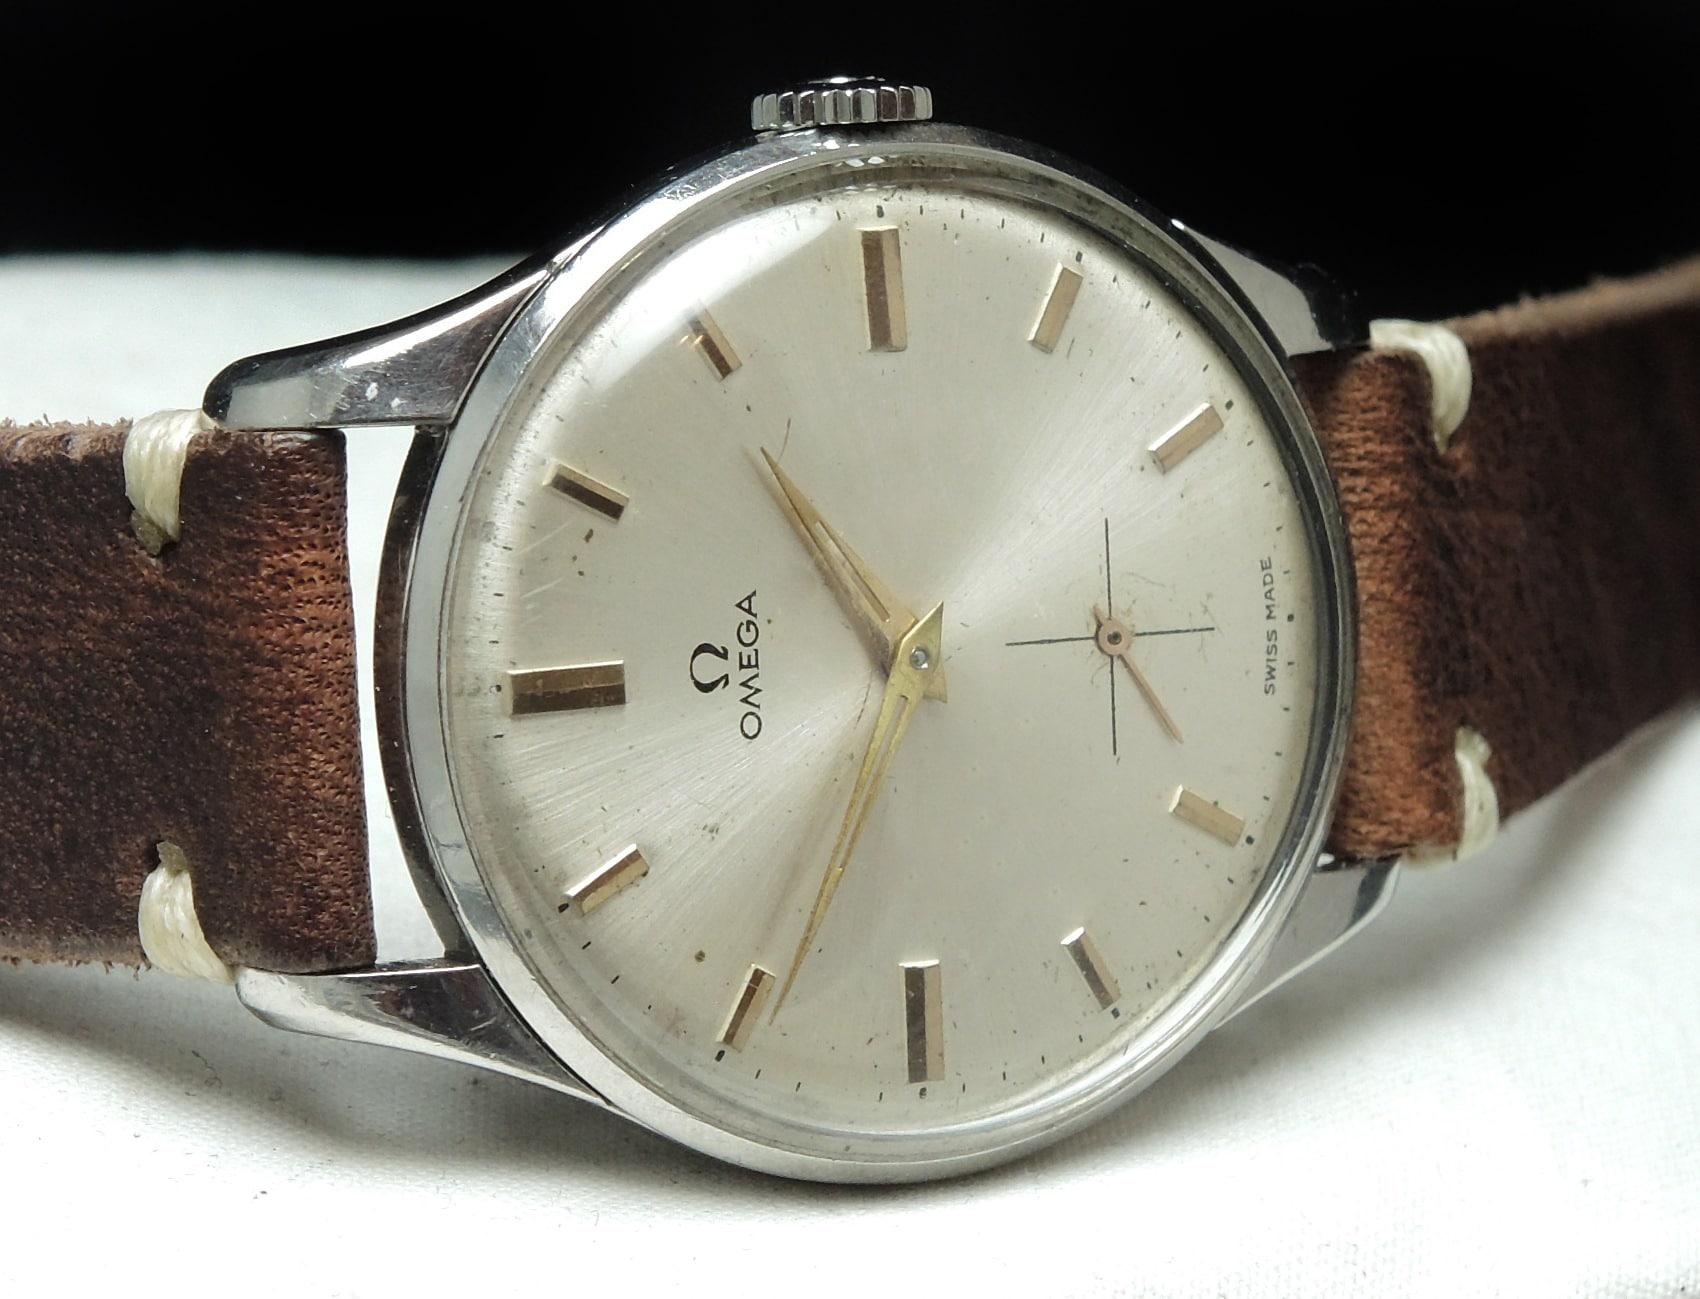 Serviced 36mm Vintage Omega Handwinding Watch